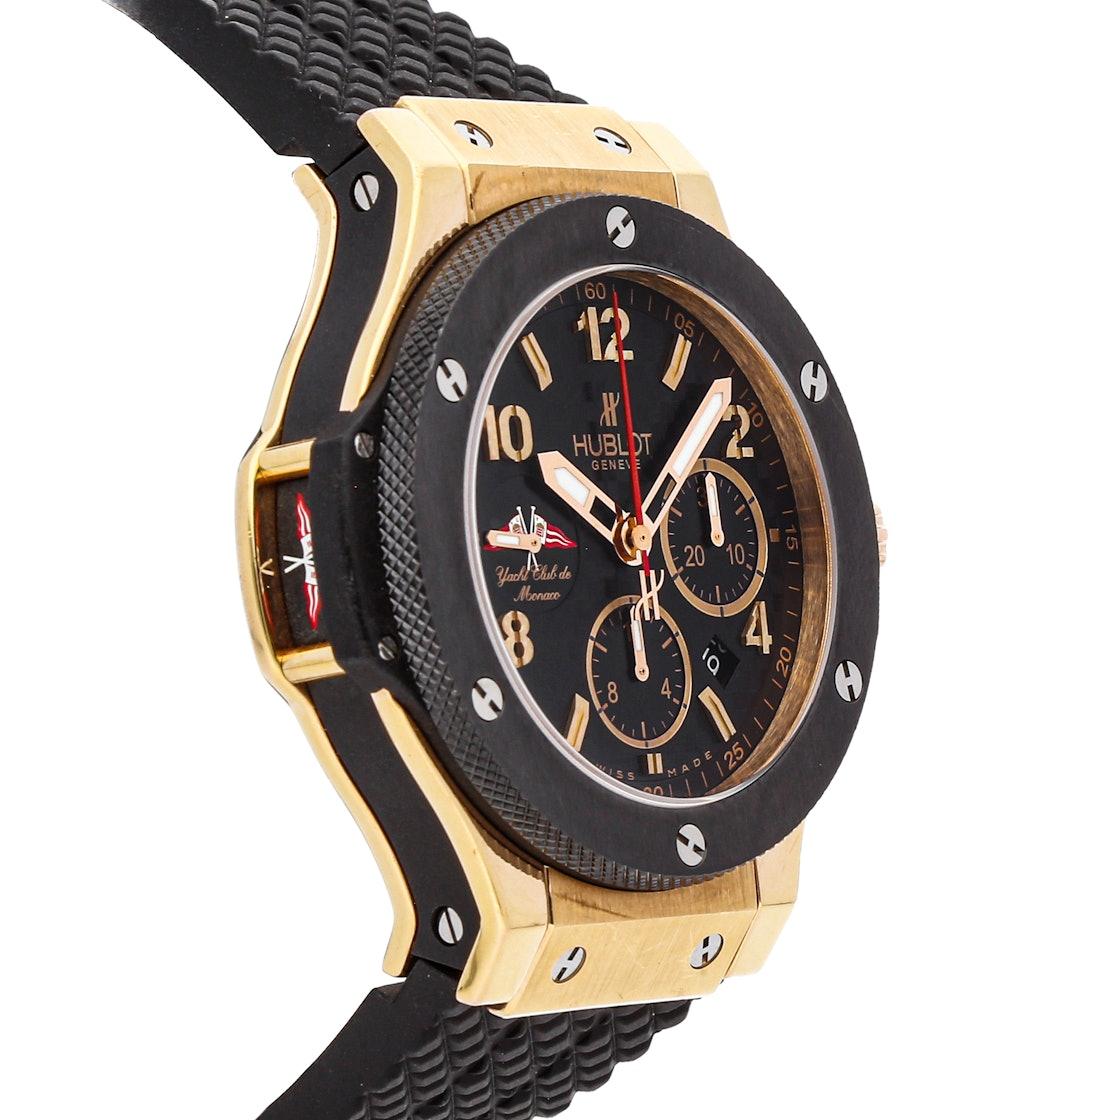 Hublot Big Bang Gold Ceramic Yacht Club Monaco Limited Edition 301.PM.131.RX.TGA06